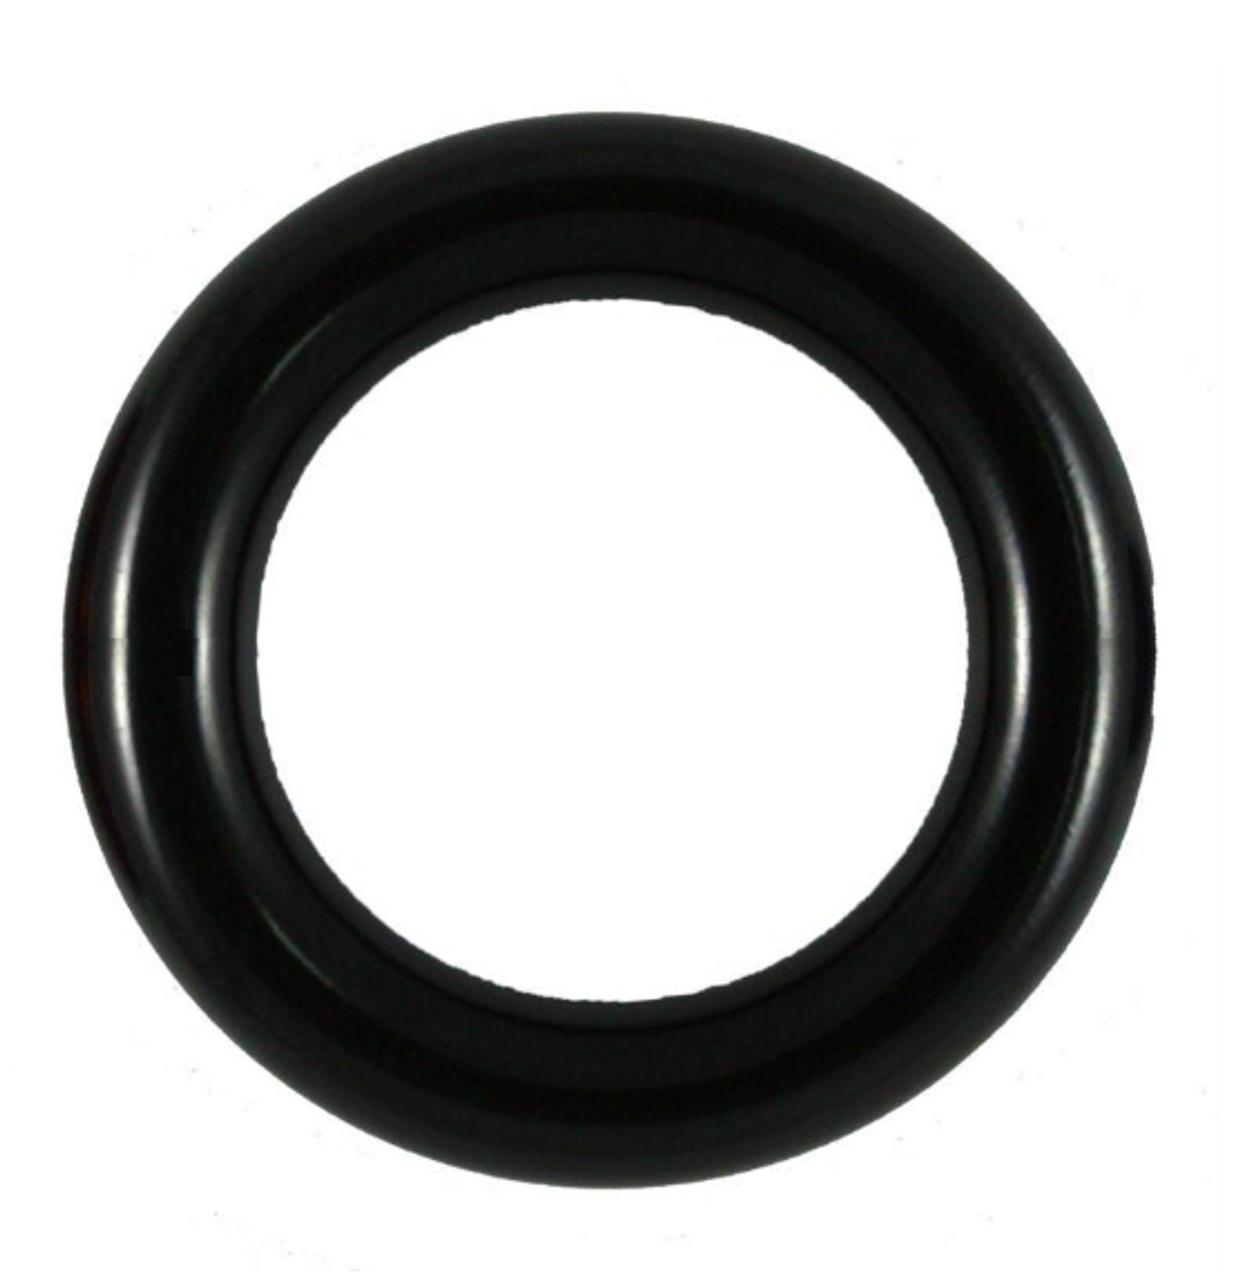 Baofeng Replacement Antenna O-Ring Seal